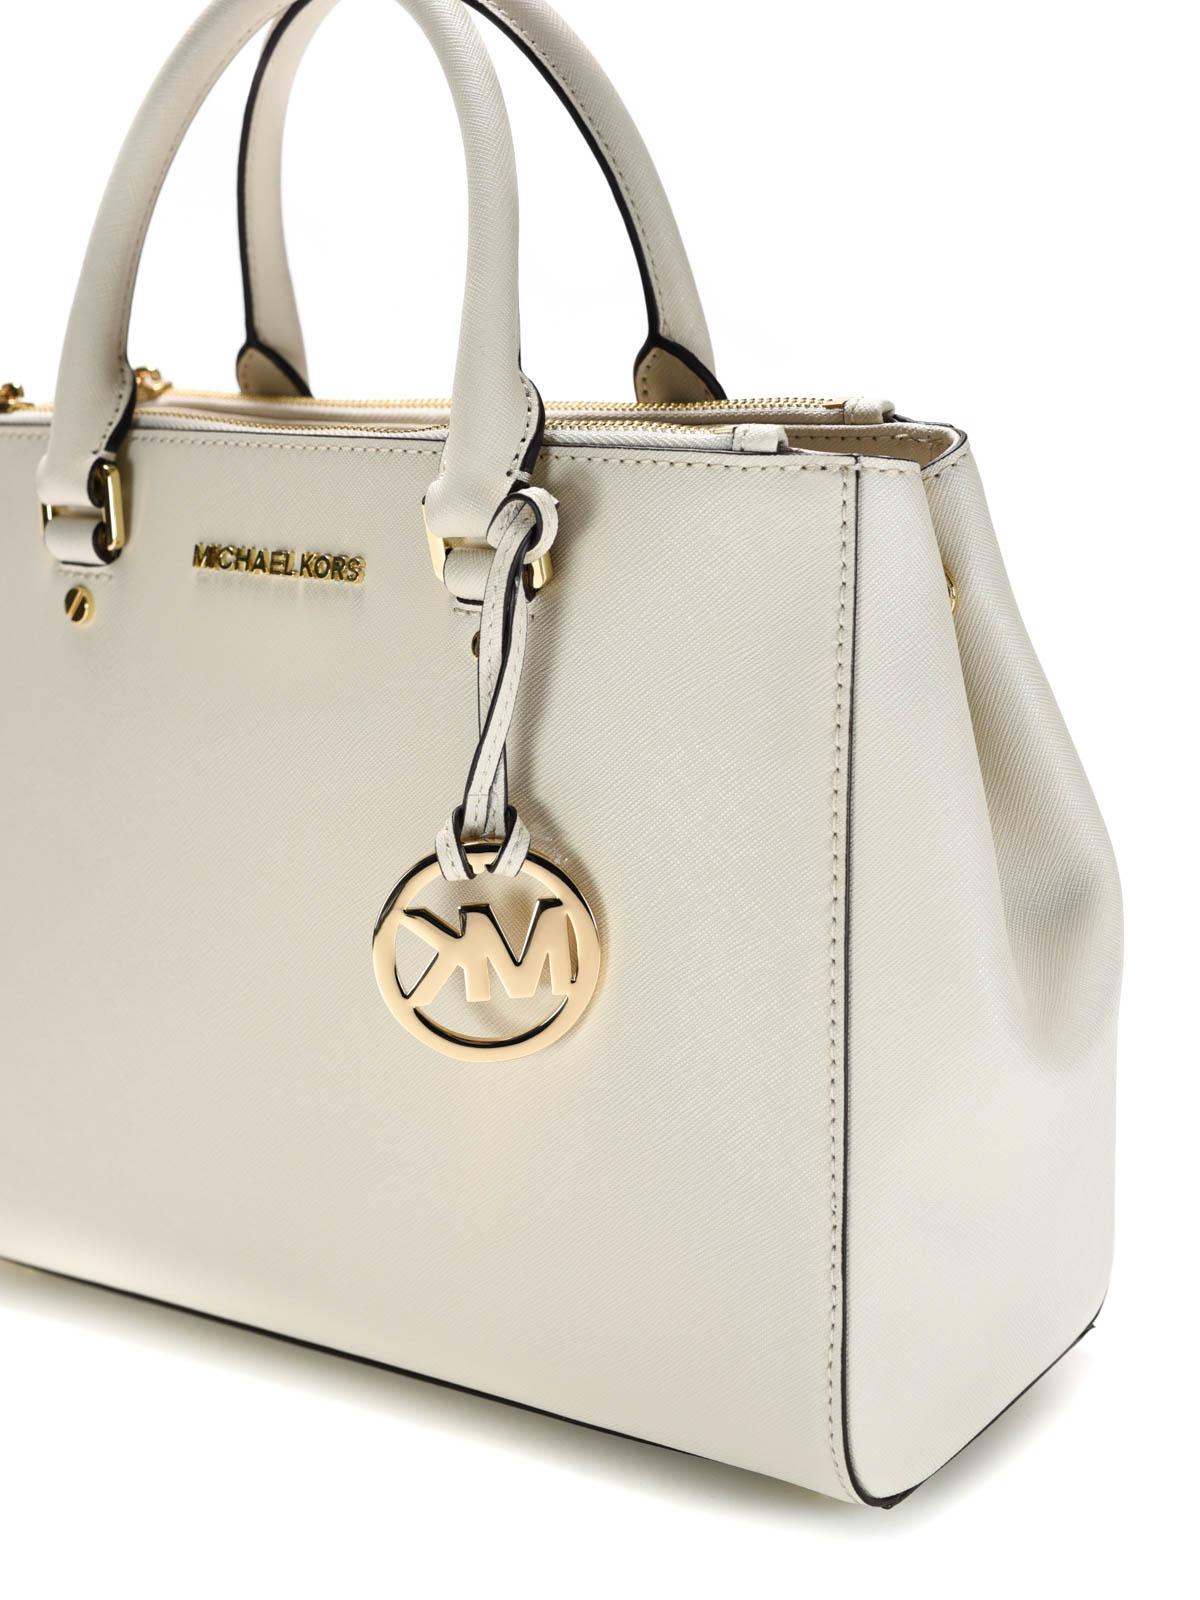 2b3a01e3c385 Michael Kors - Sutton Saffiano leather large tote - totes bags ...